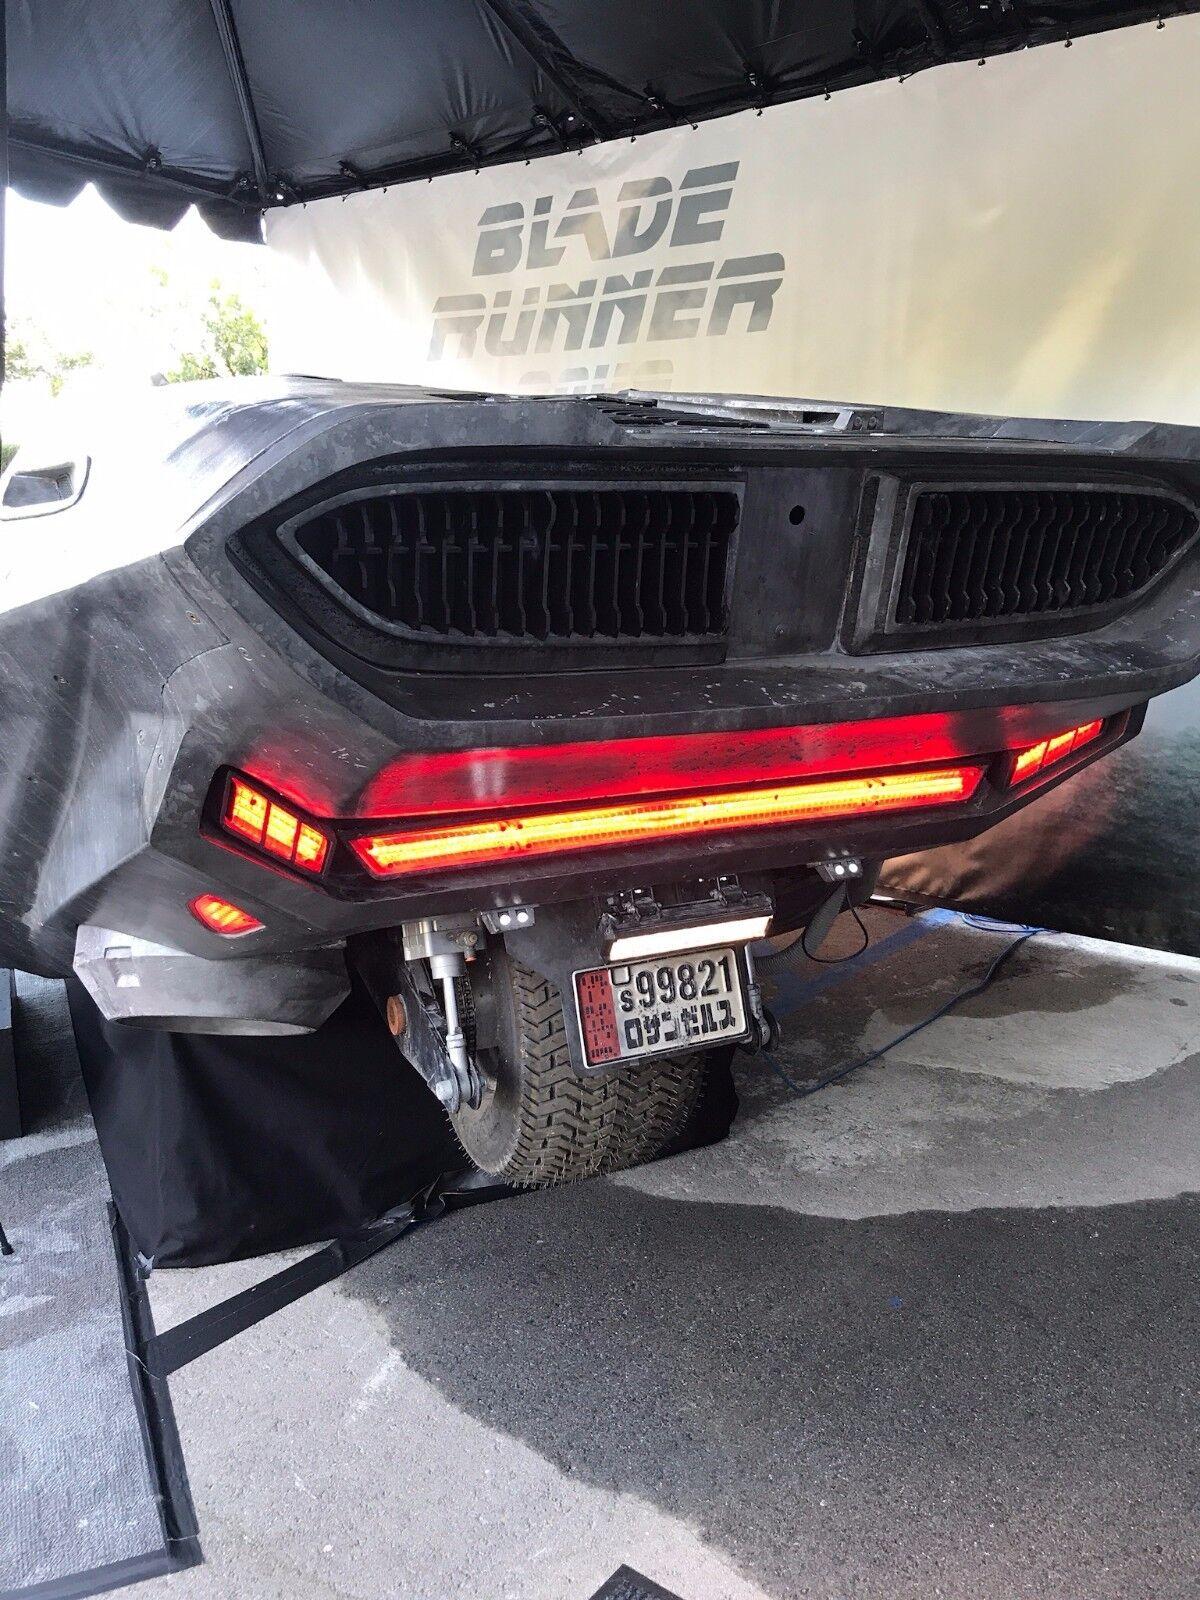 Blade Runner 2049 / Ryan Gosling Officer K's Spinner STAMPED Prop License Plate